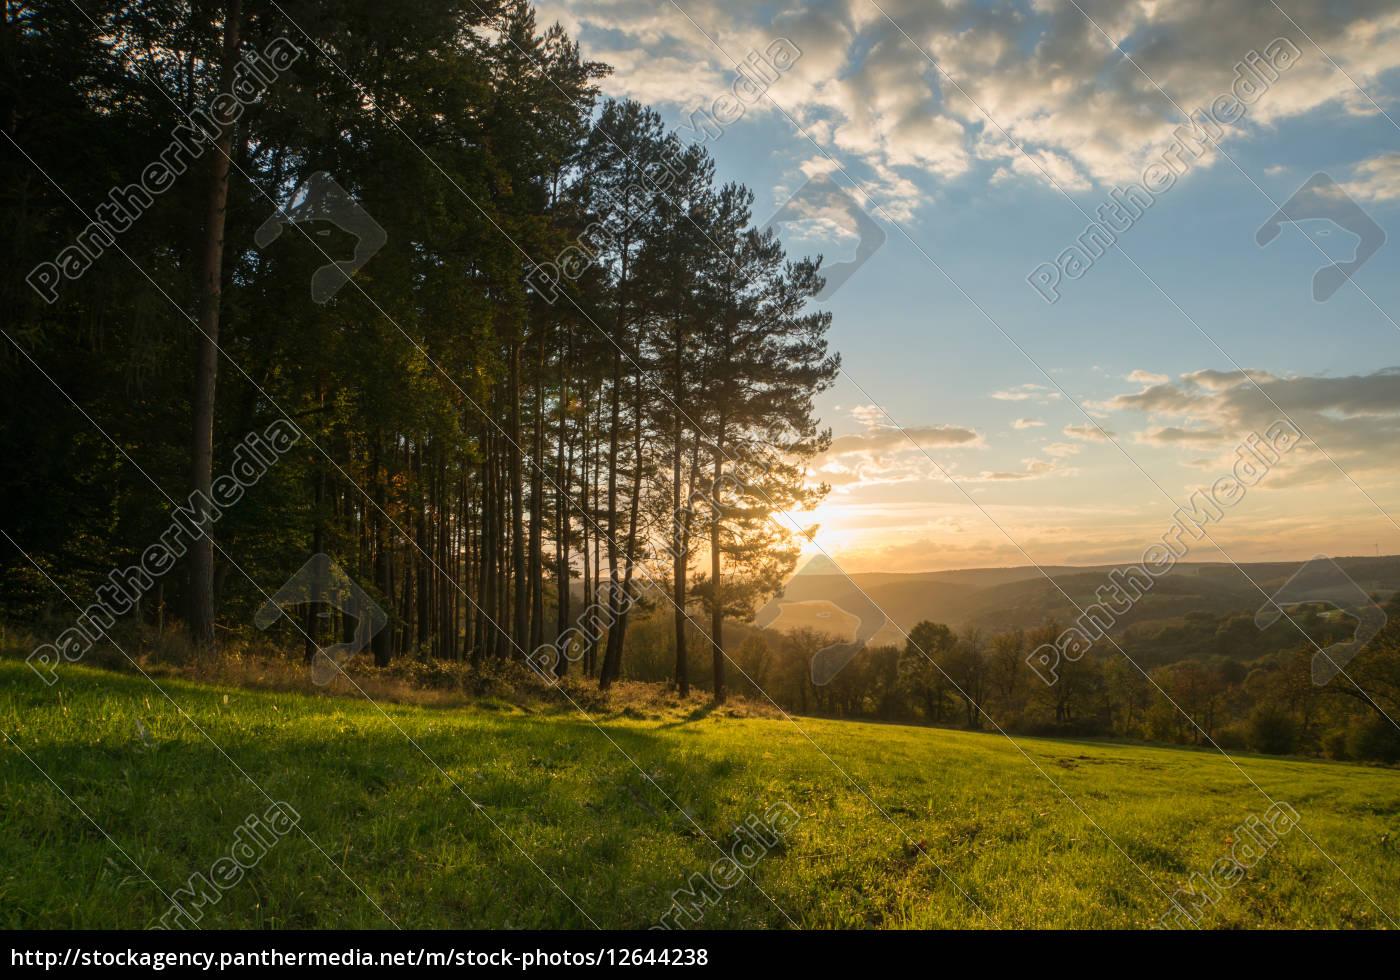 Royalty free image 12644238 - shine shines bright lucent light serene  luminous tree